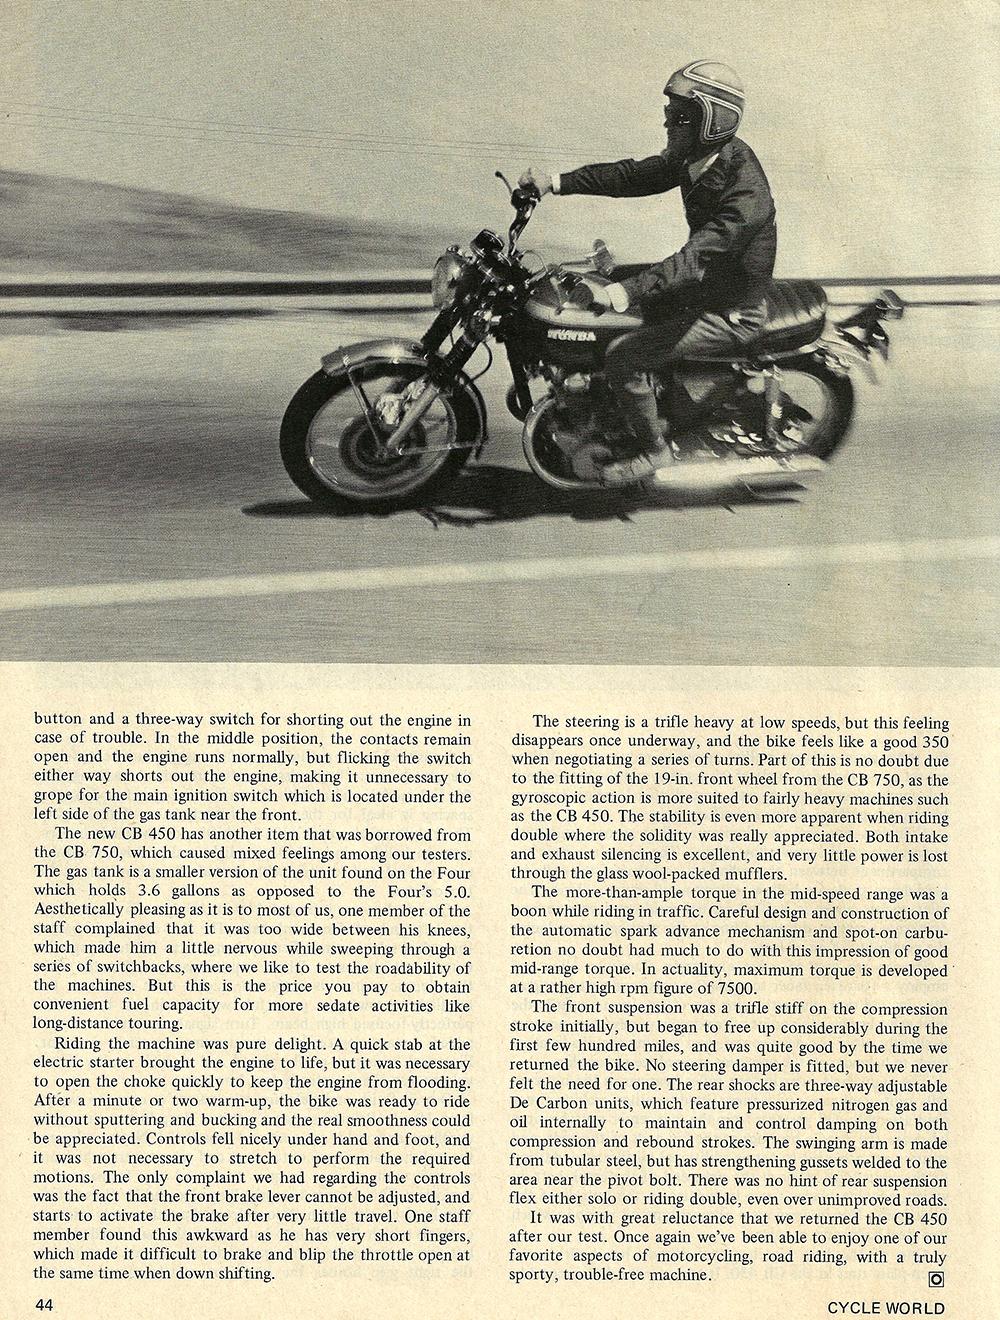 1970 Honda CB450 road test 04.jpg